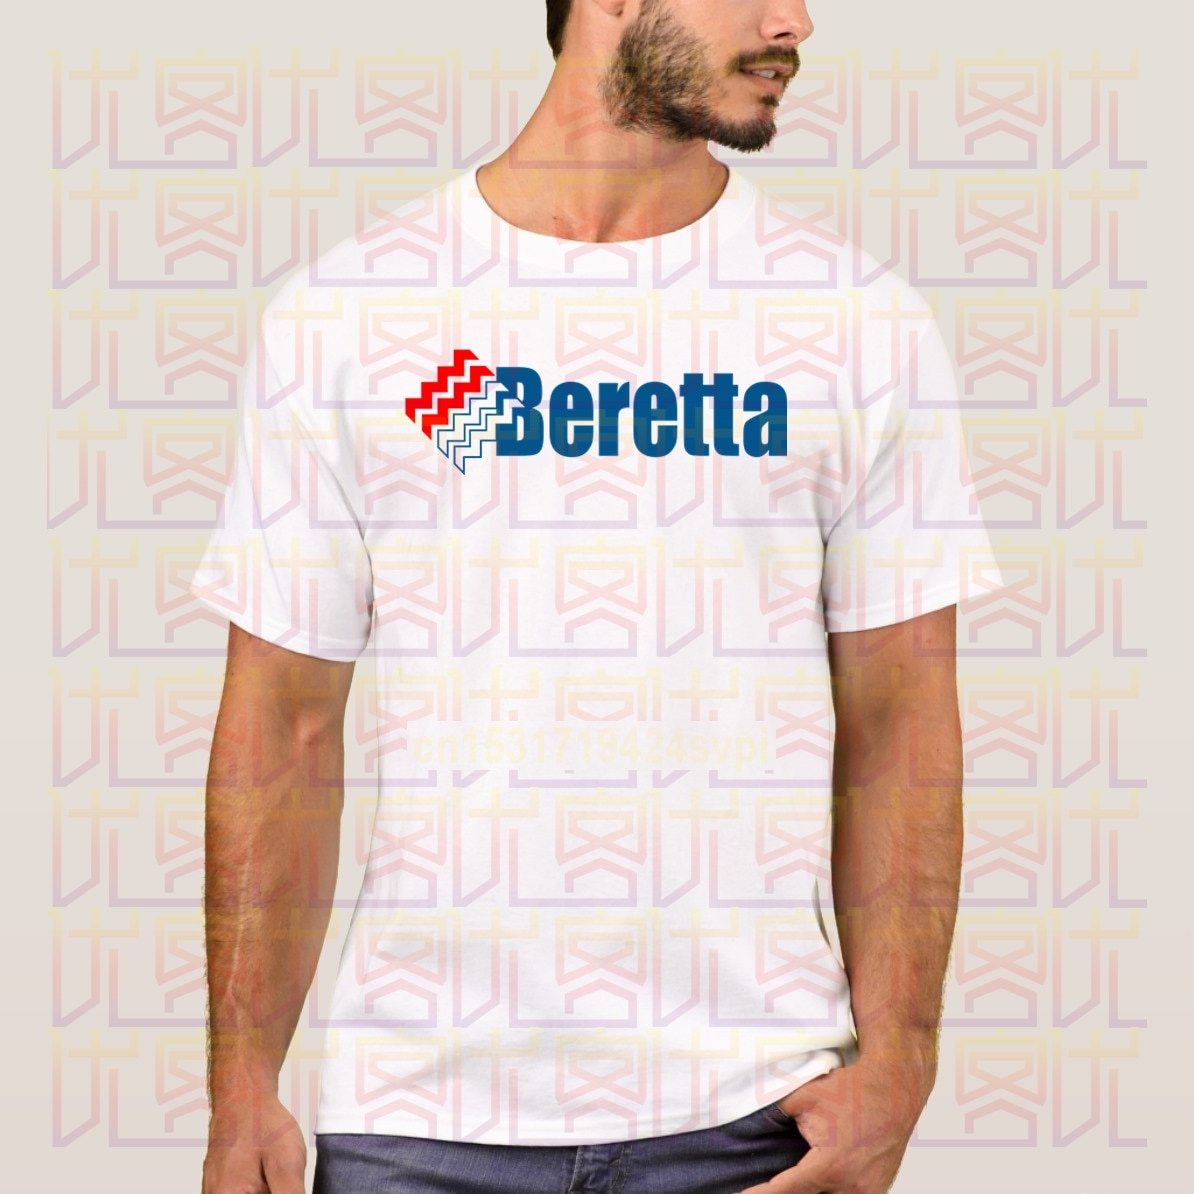 Camiseta BERETTA a la moda para hombre, envío gratis, camiseta de manga corta increíble, camiseta exclusiva 100% de algodón con cuello redondo, camiseta Popular